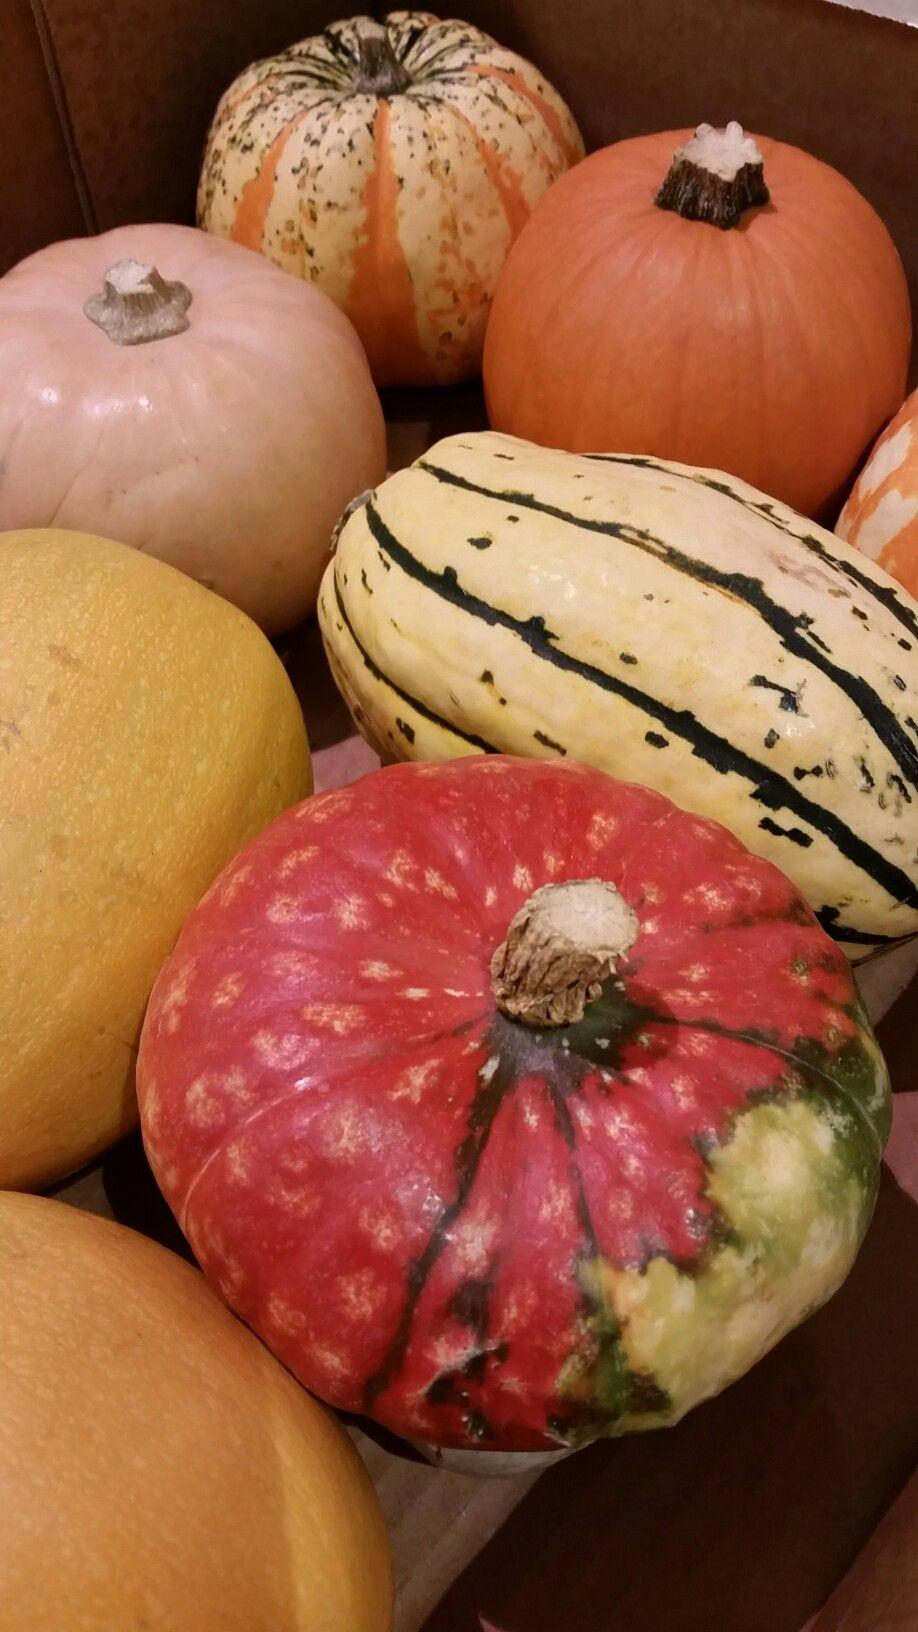 Beautiful coloured pumpkins perfect for autumn decor.